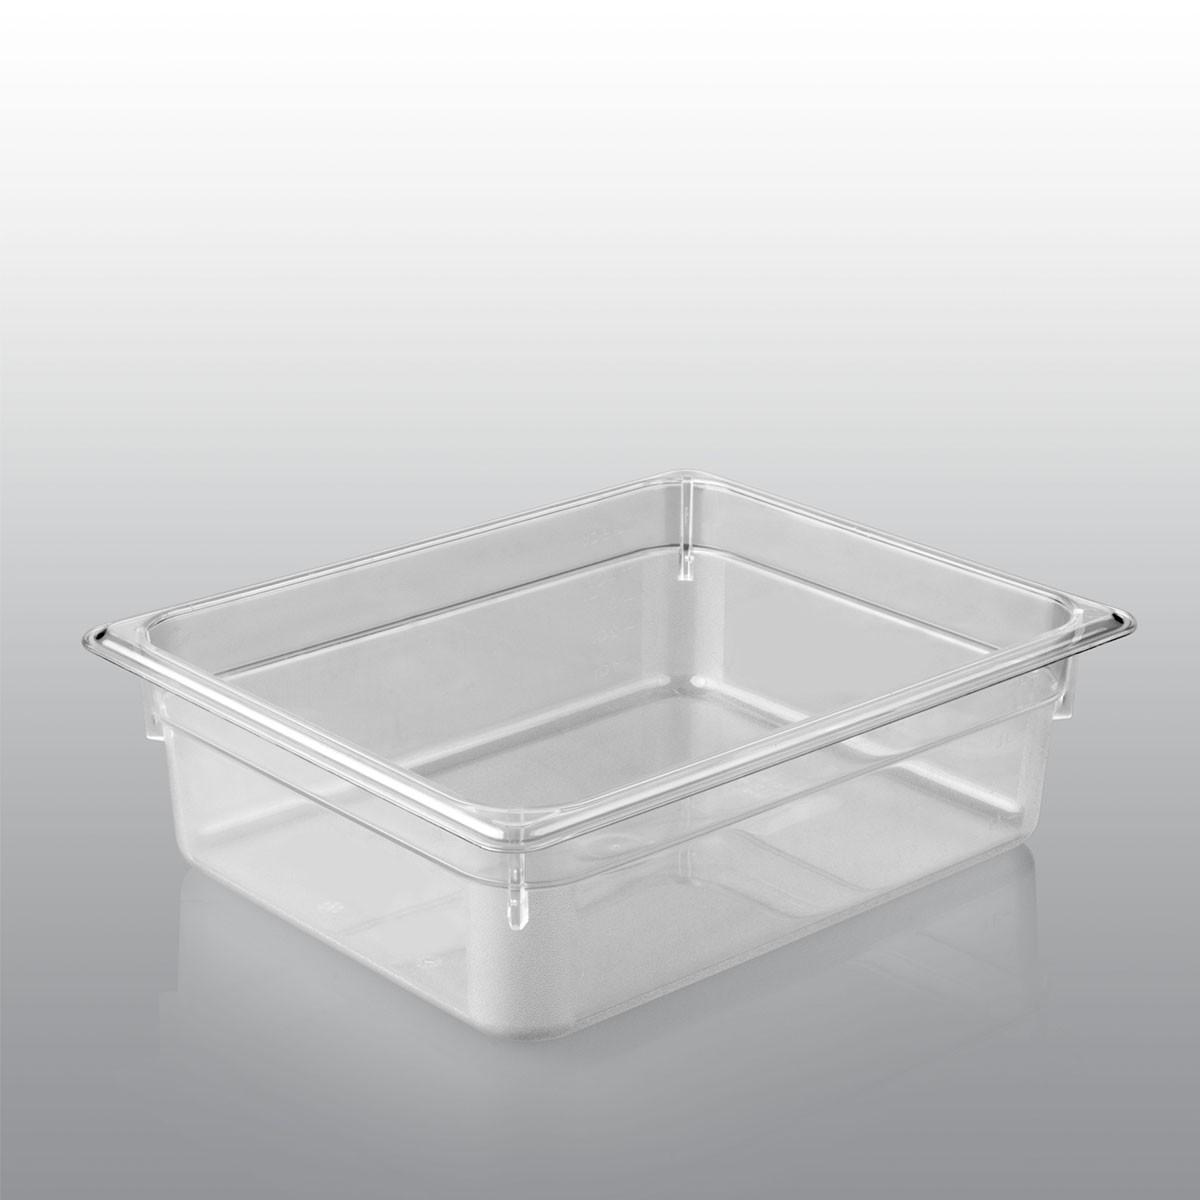 GN-Behälter GN 1/2 aus Polycarbonat (Tiefe: 100mm) 6,5 L Saro